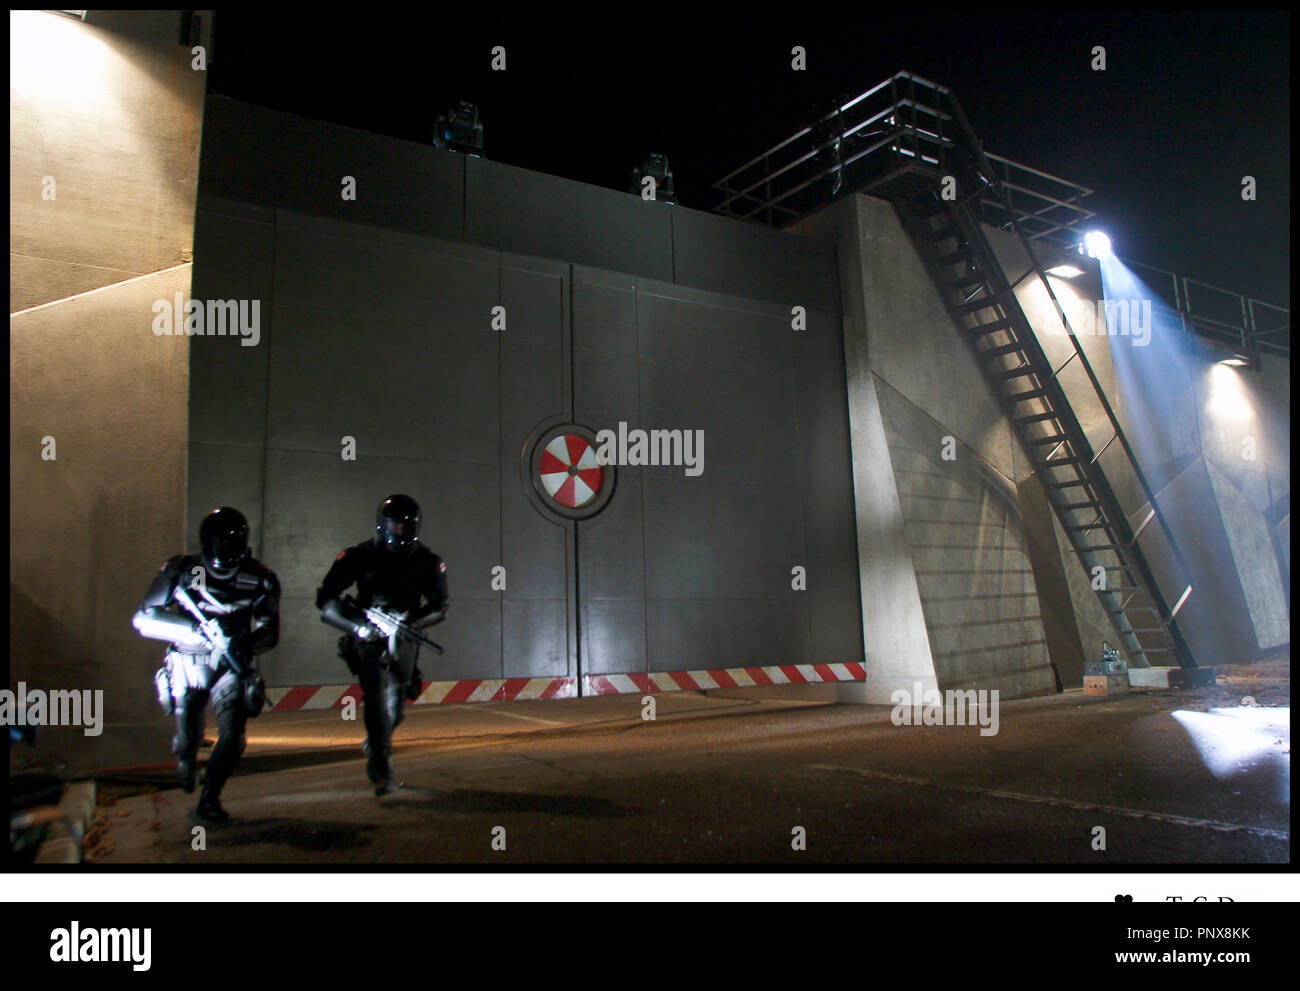 Resident Evil 2 Stock Photos & Resident Evil 2 Stock Images - Alamy